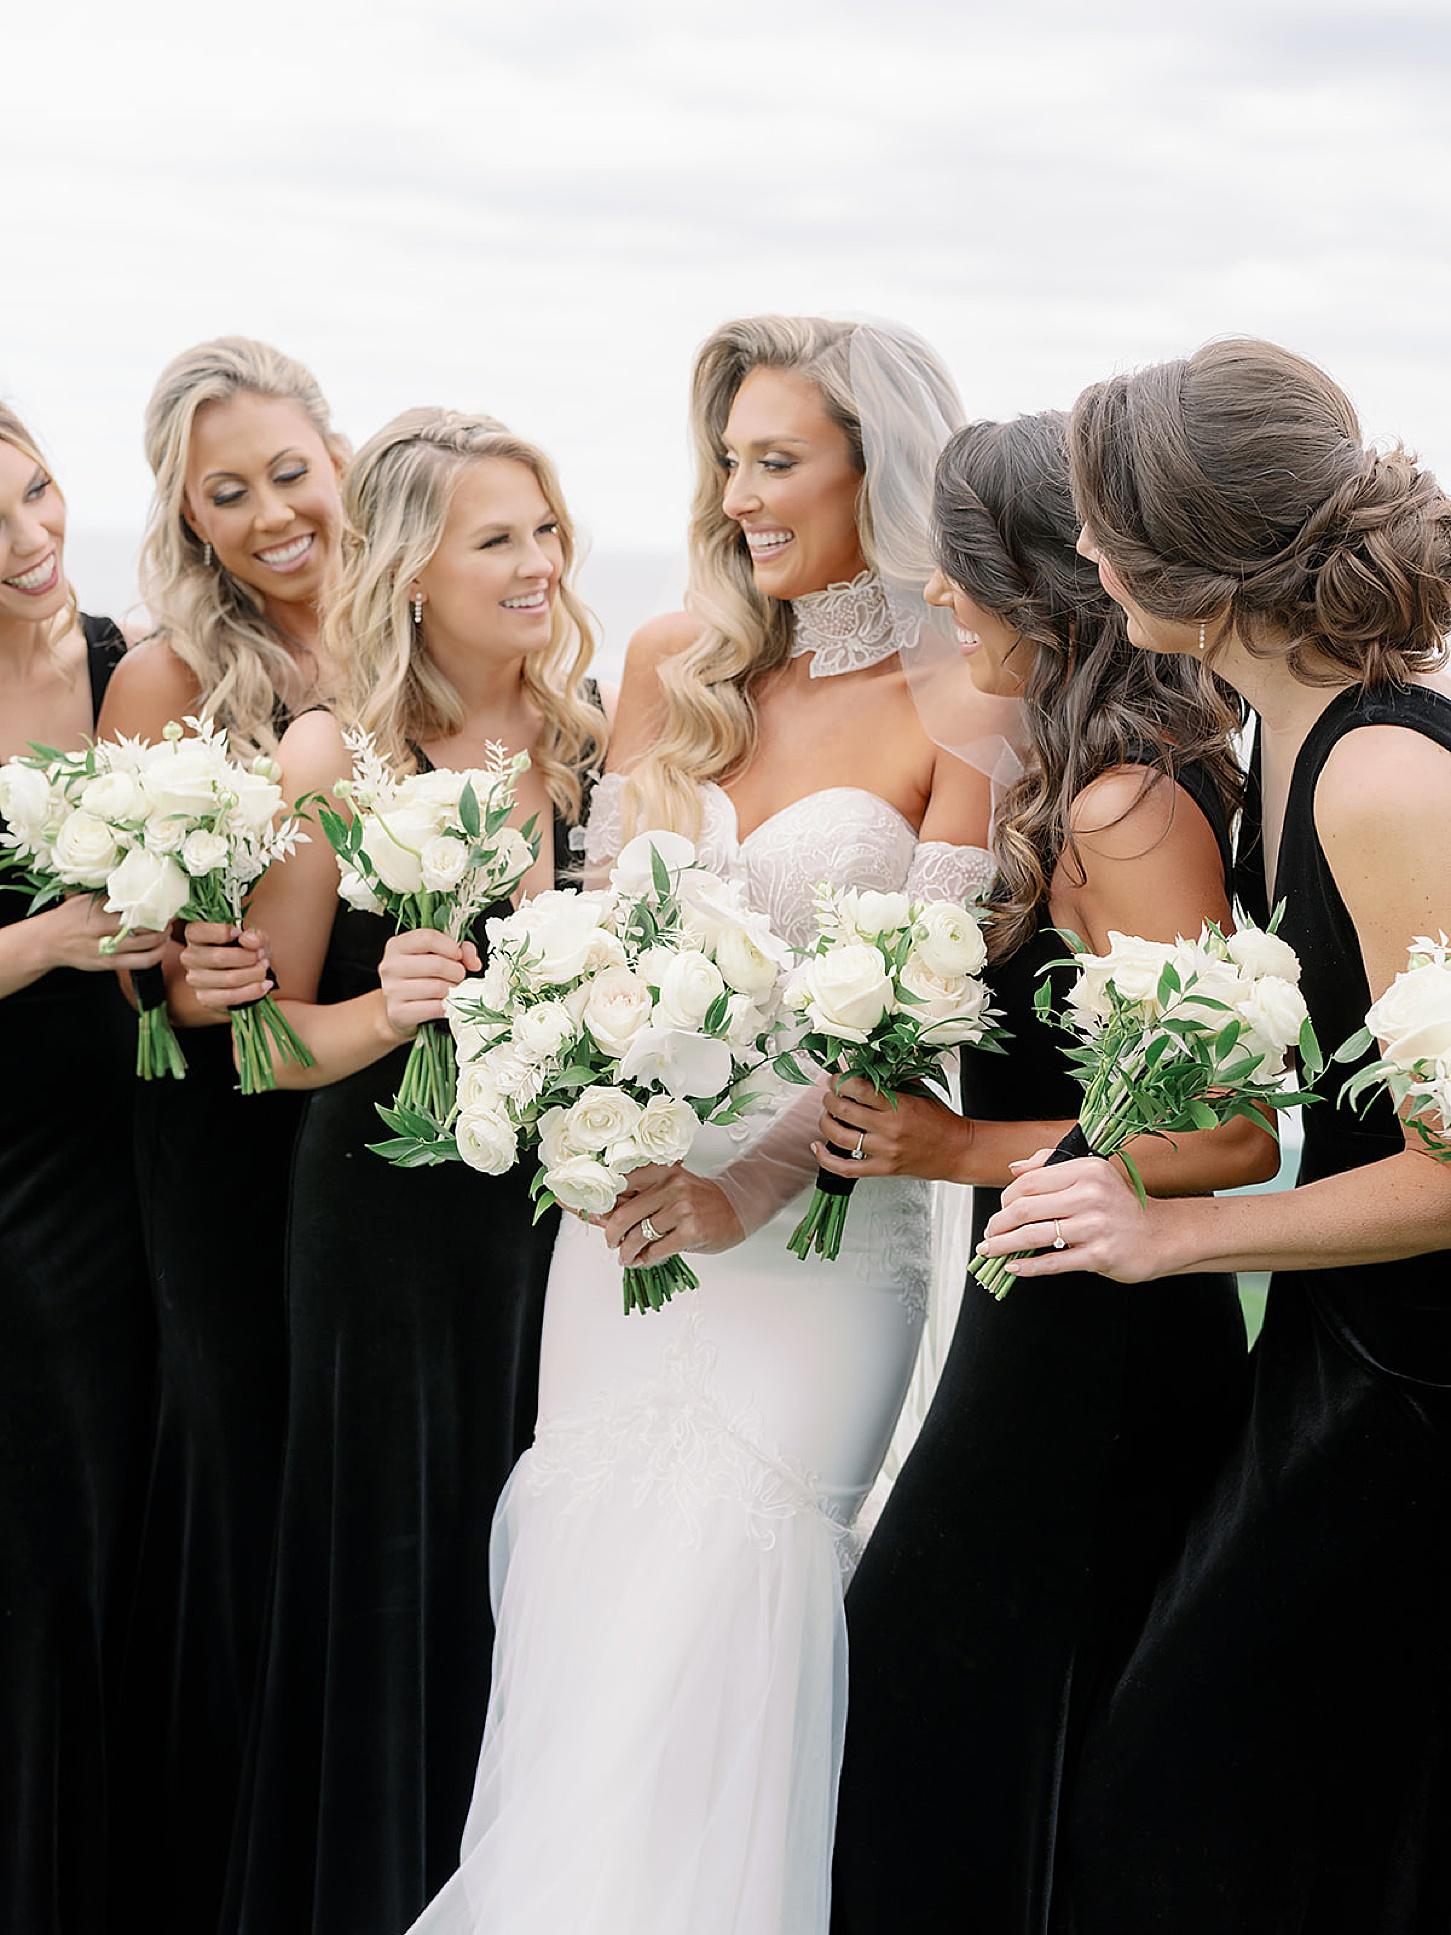 Atlantic City Wedding Photography Studio by Magdalena Studios Lexy Cha 0036